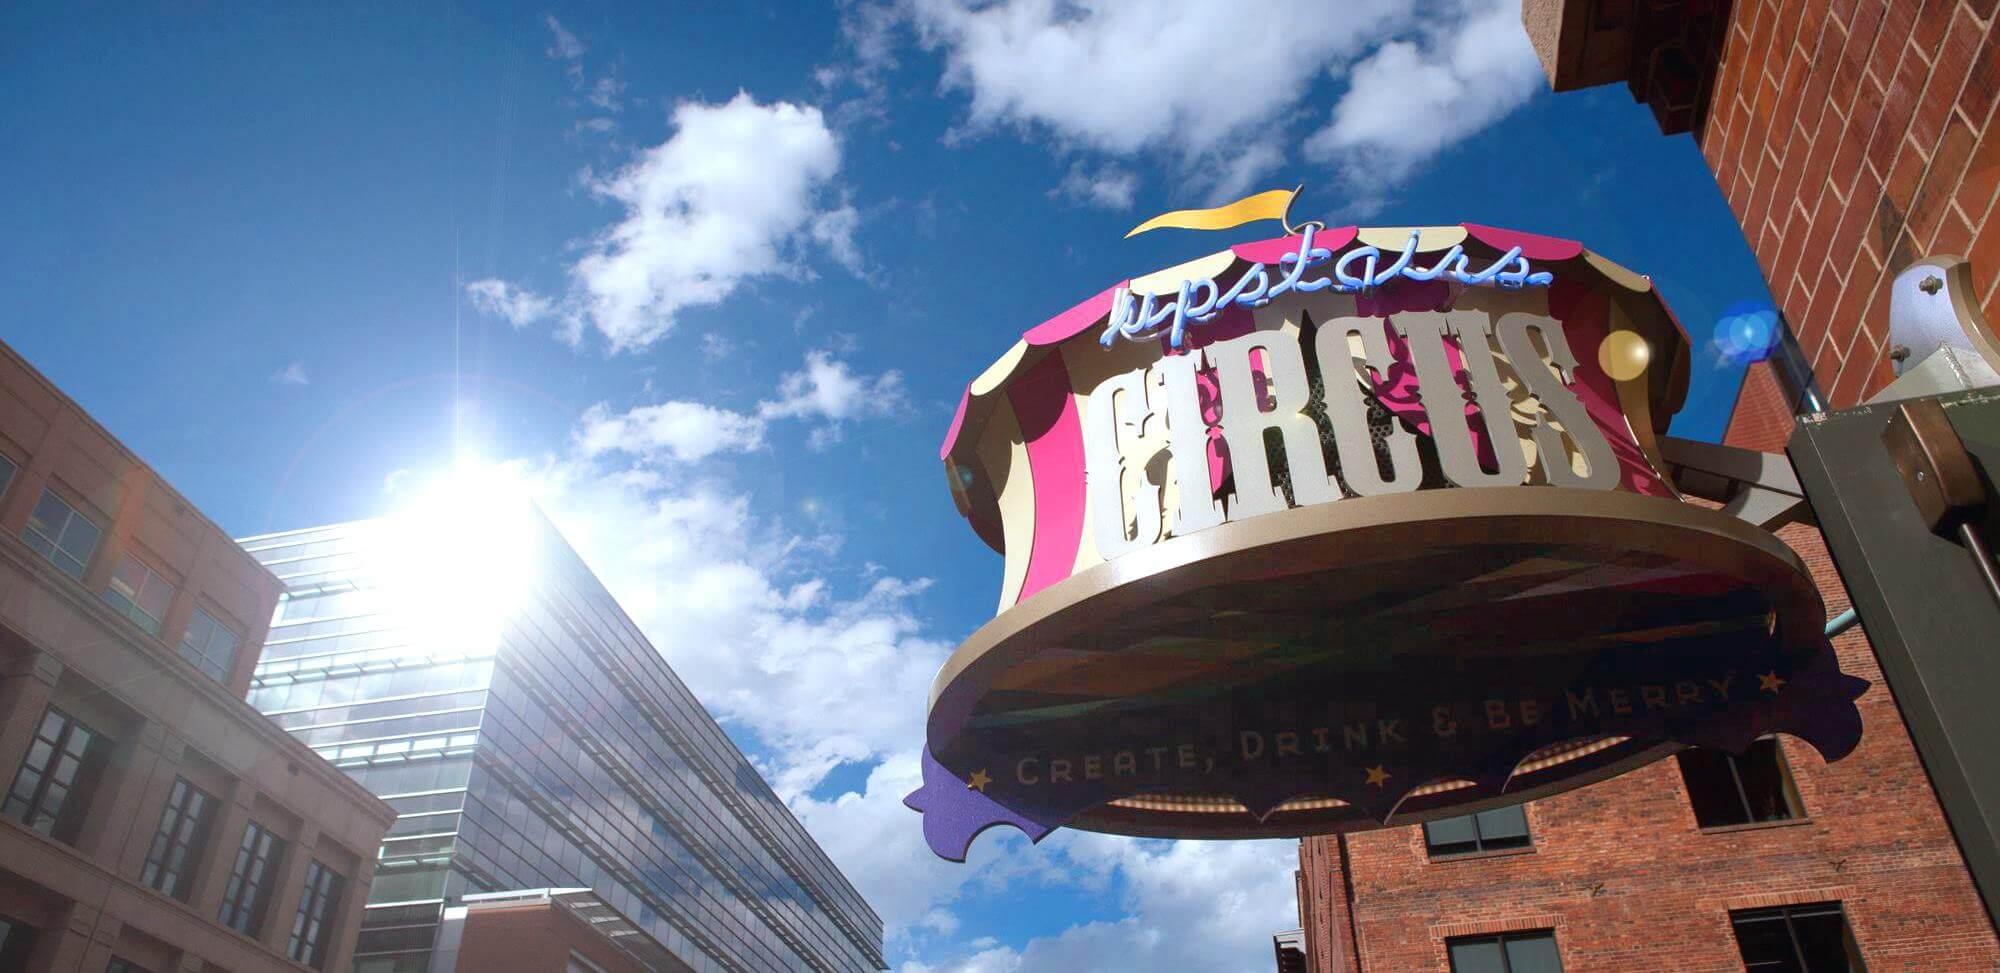 Upstairs Circus| The Denver Ear